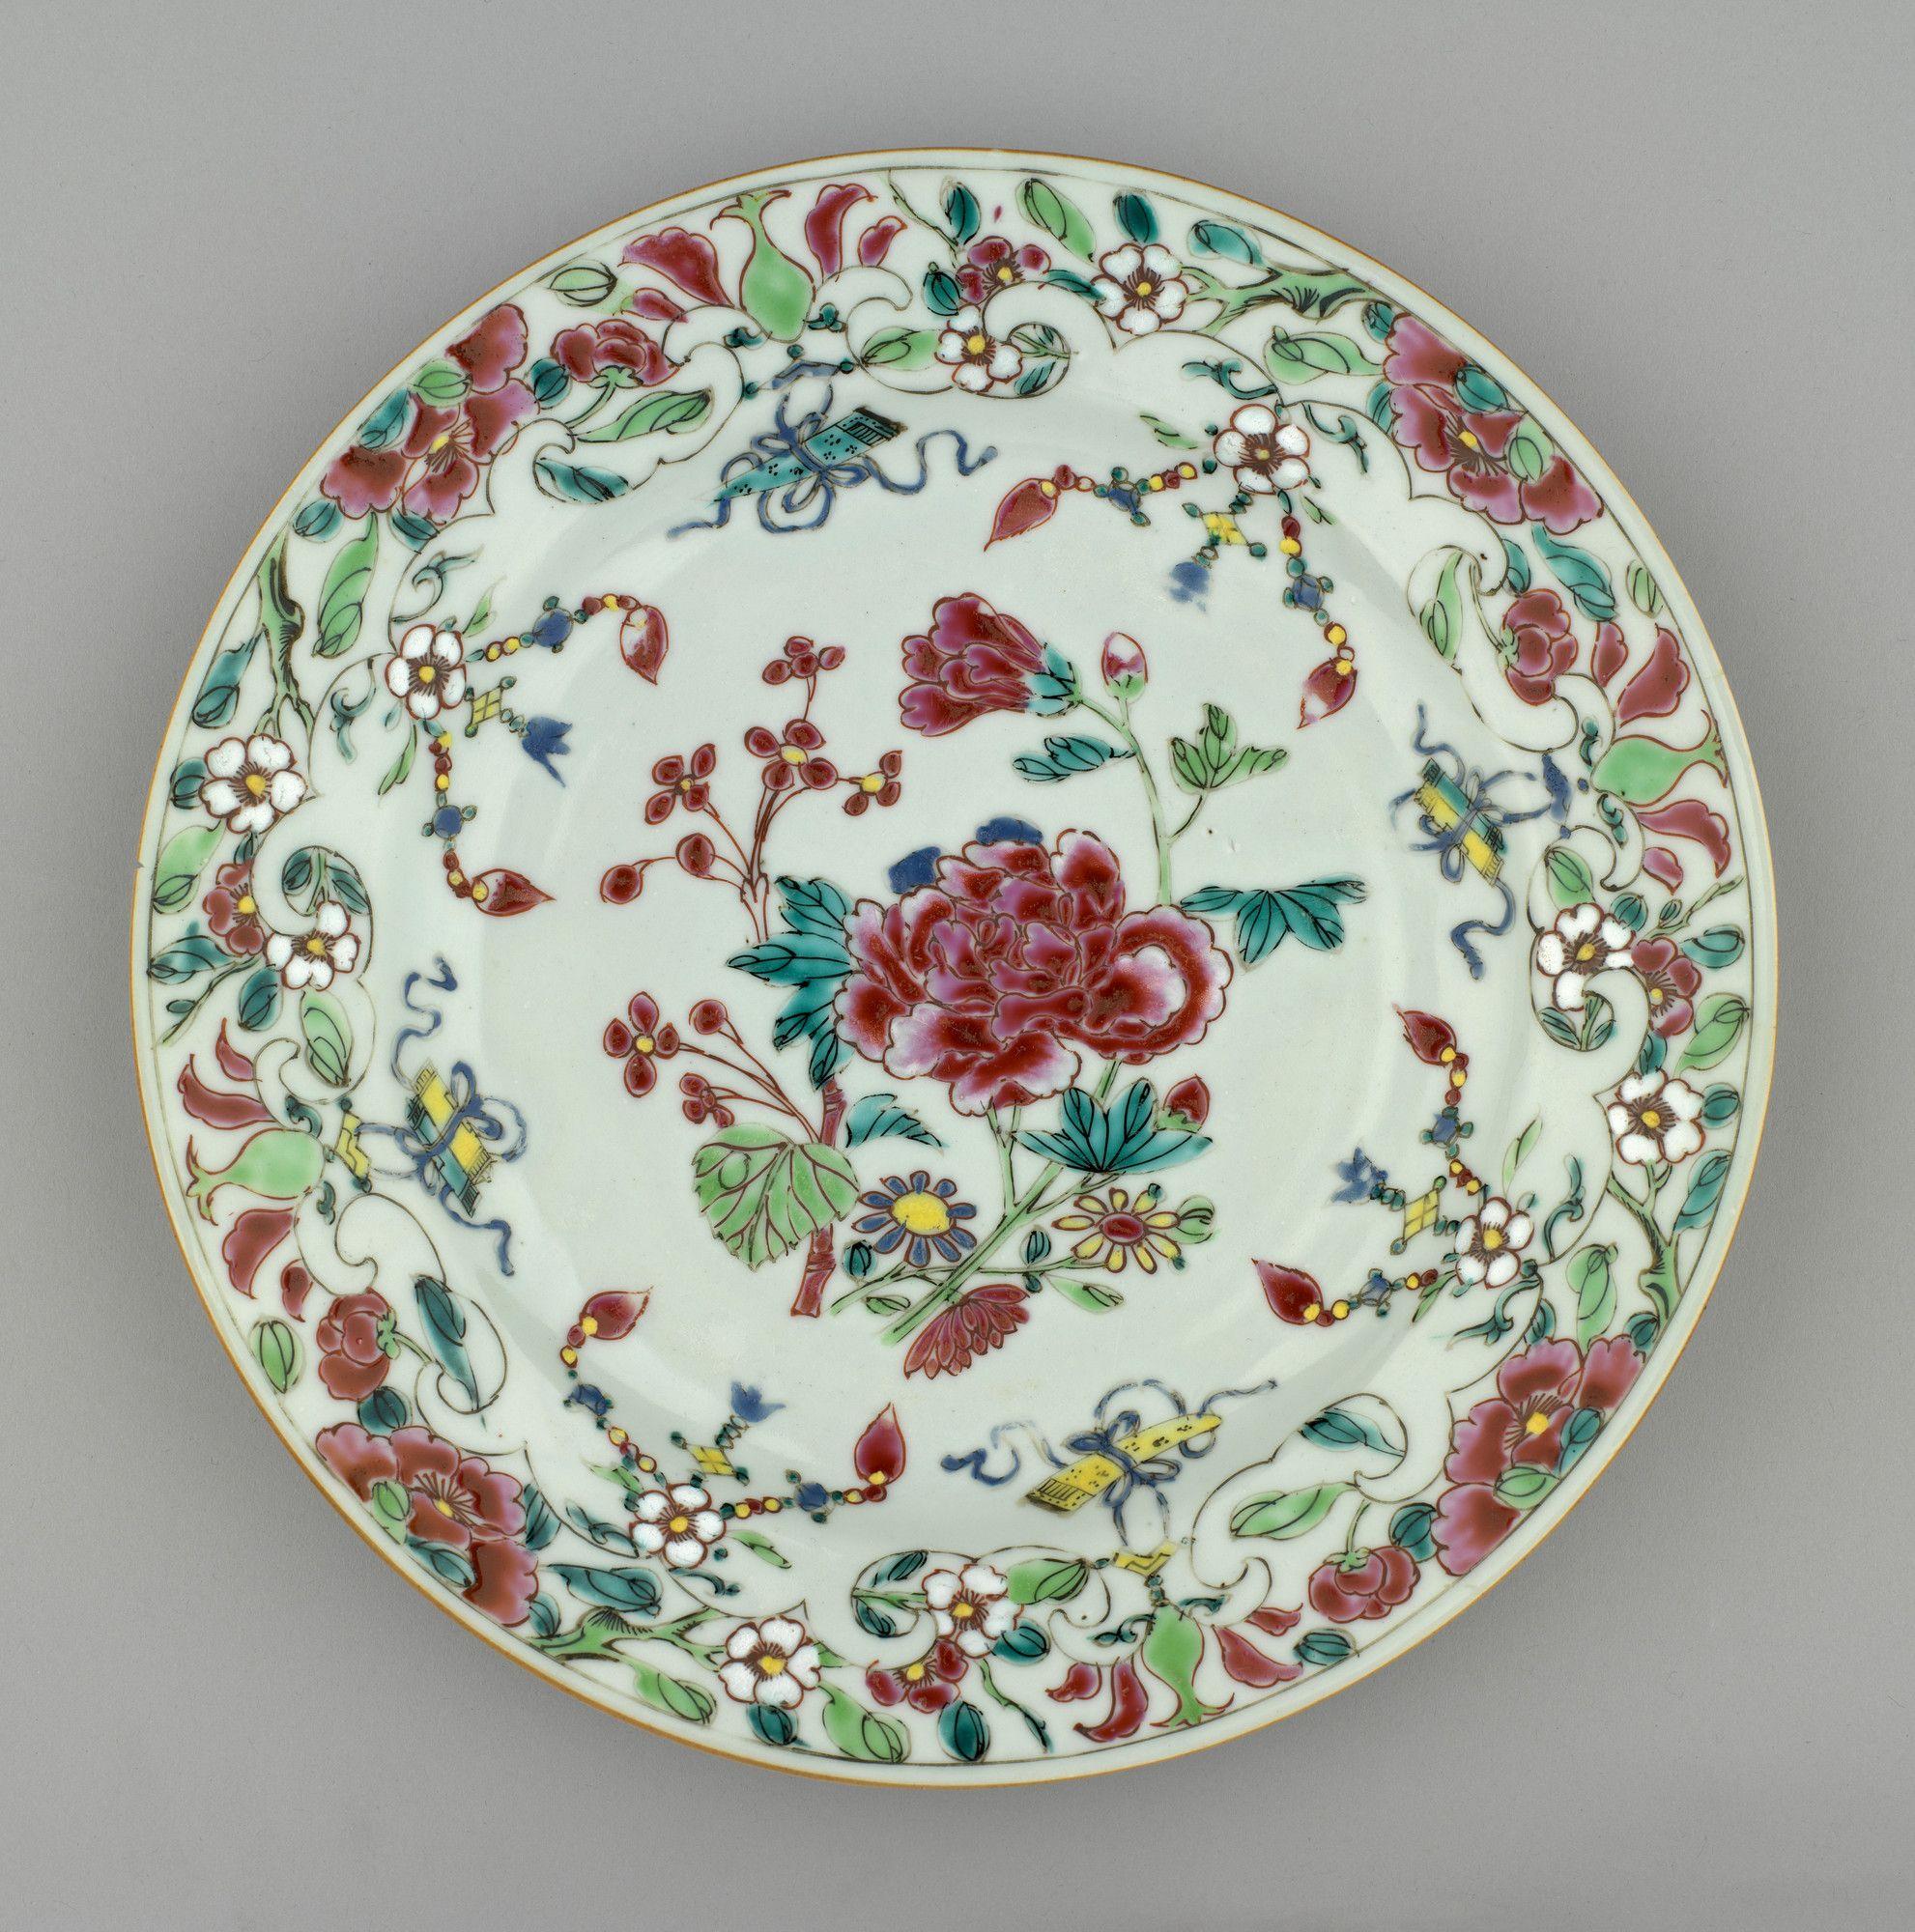 Jingdezhen Jiangxi Province China Set Of Plates Decoracao Antiguidades